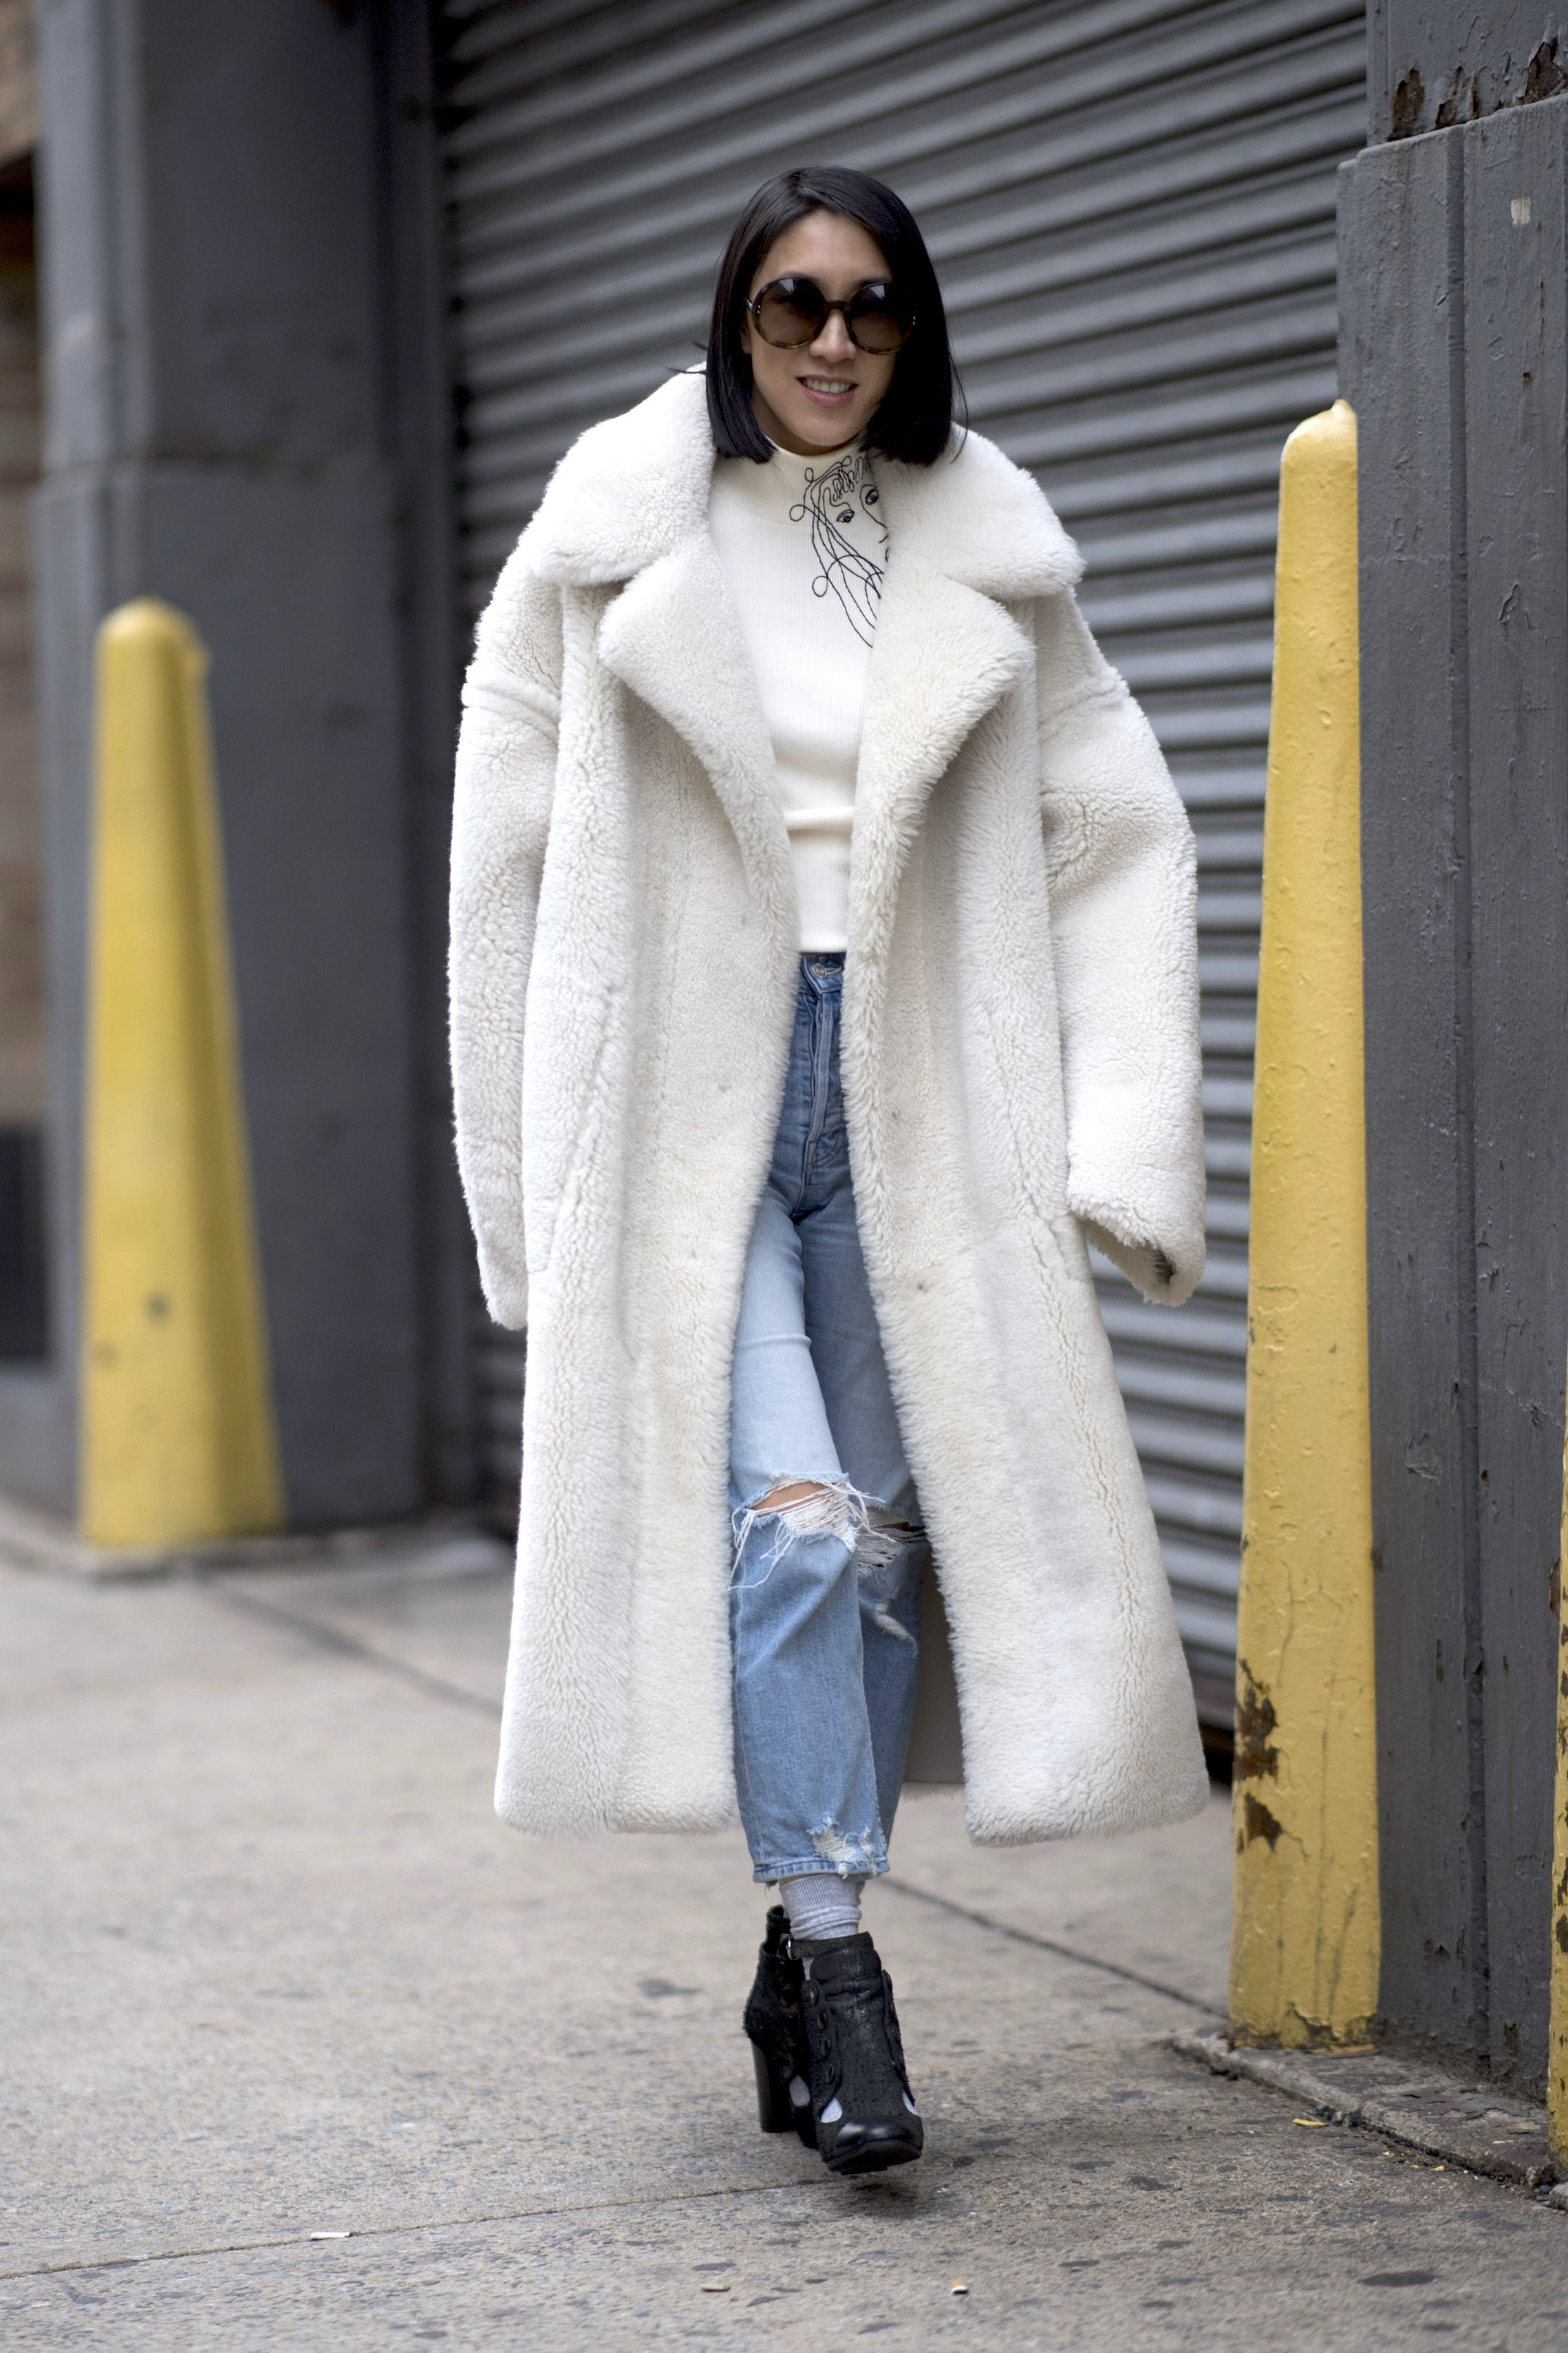 pellicce 2019, pellicce ecologiche 2019, moda pellicce inverno 2019, pellicce colorate, eco pellicce colorate, pellicce bianche, pellicce ecologiche inverno 2019, come abbinare la pelliccia, come indossare la pelliccia rossa, come abbinare la pelliccia bianca